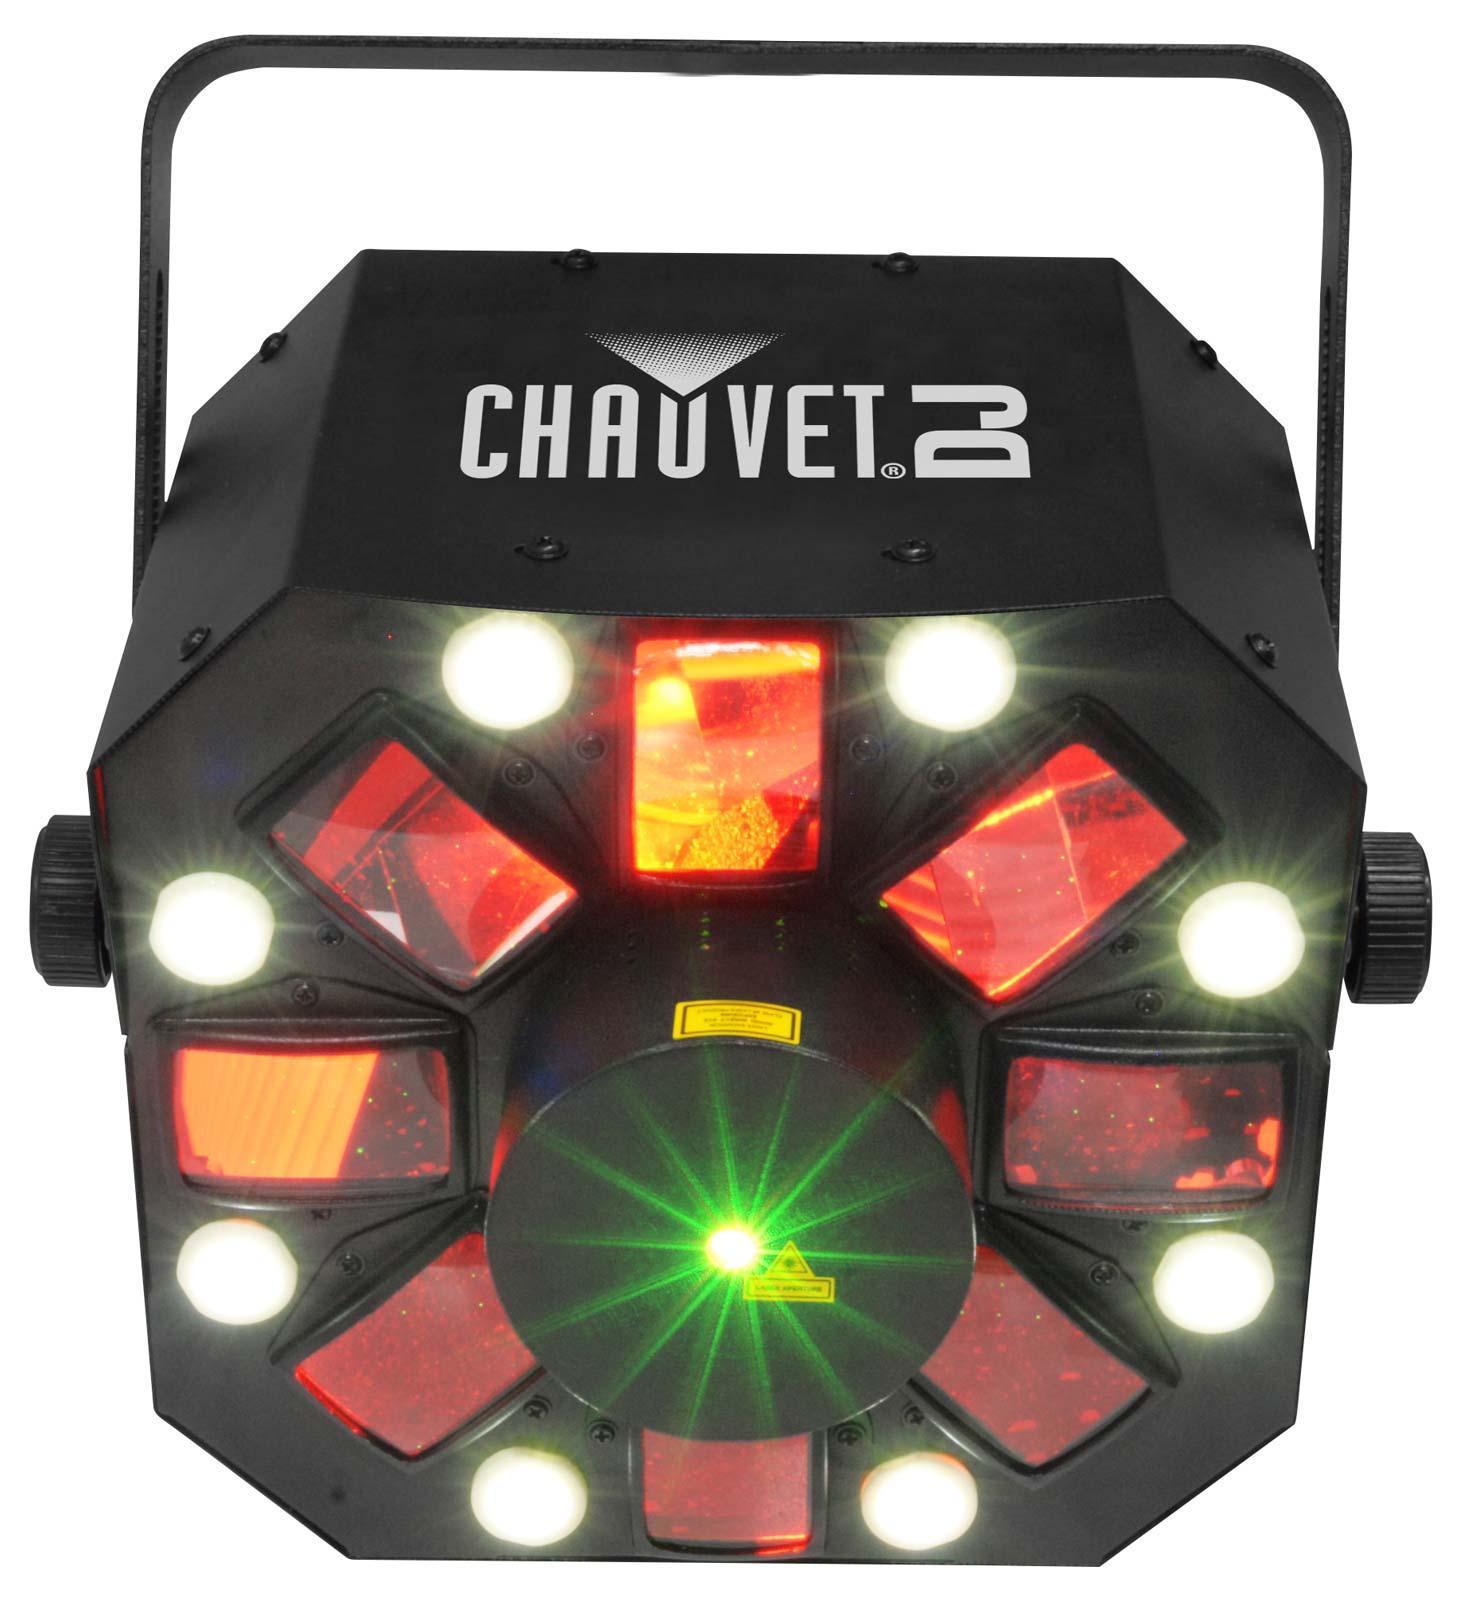 Chauvet-DJ Swarm 5 FX